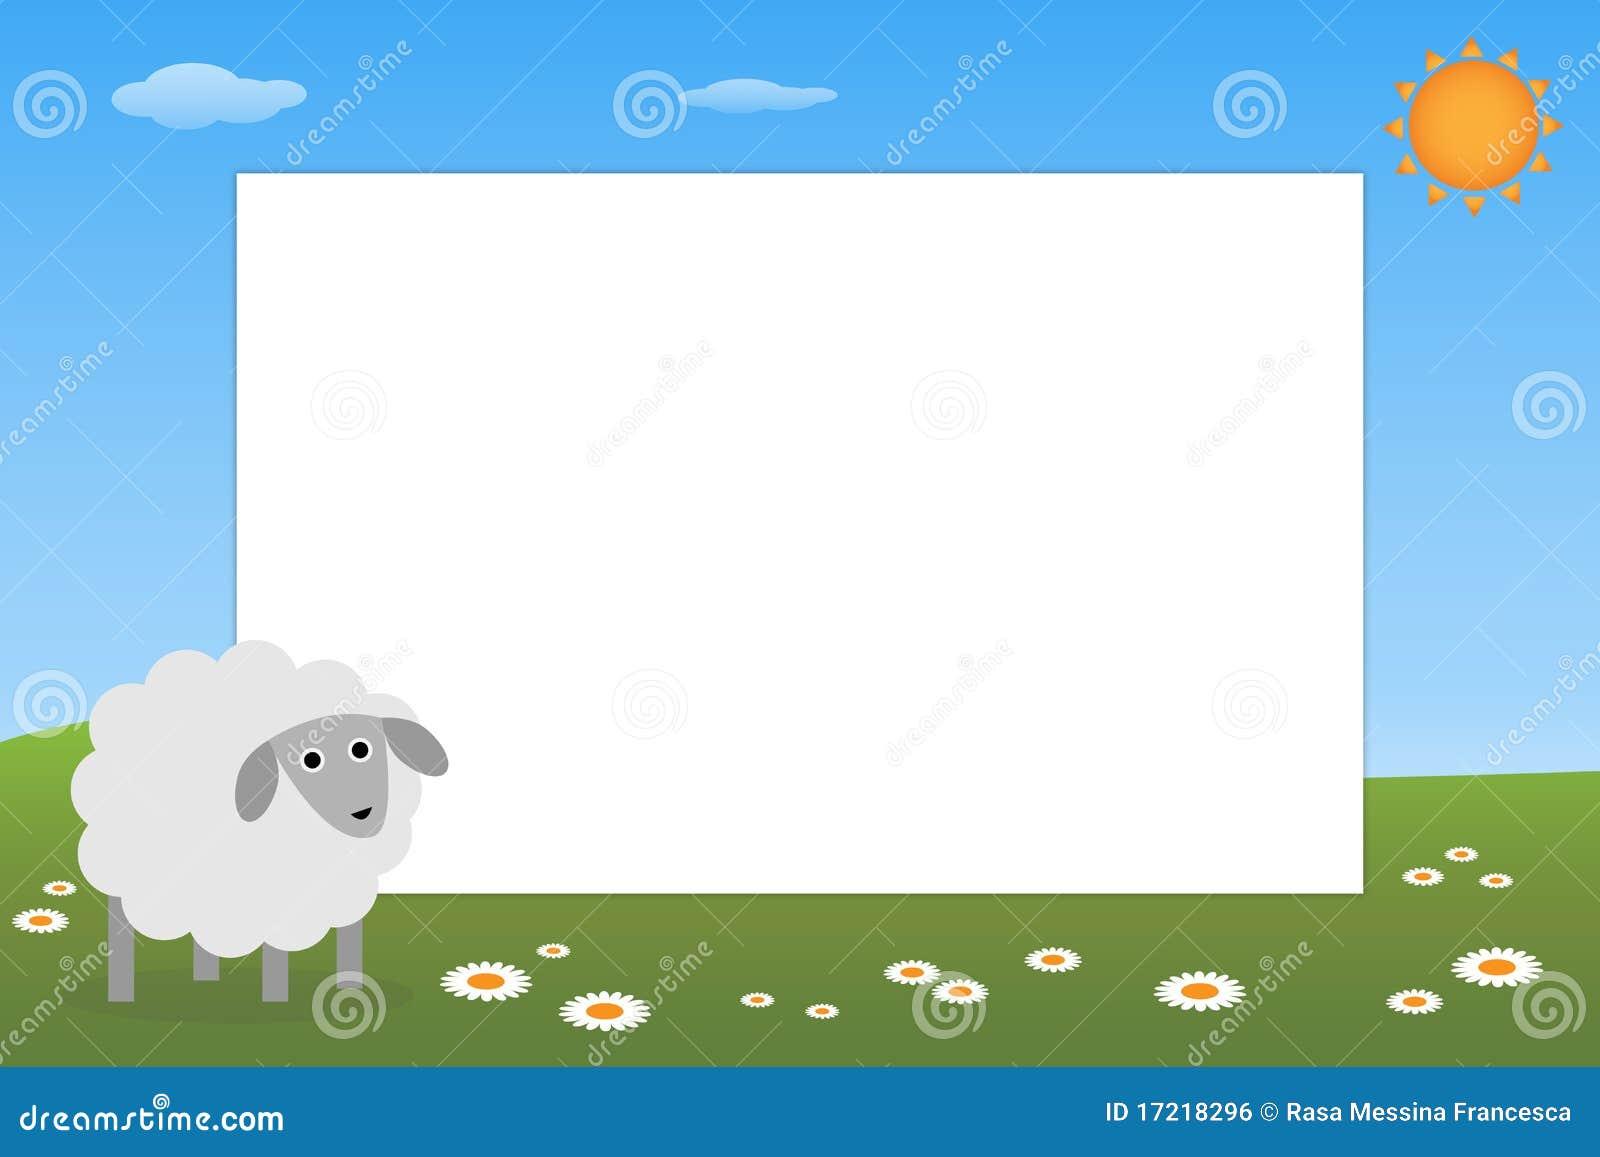 Kid Frame Sheep Royalty Free Stock Image Image 17218296